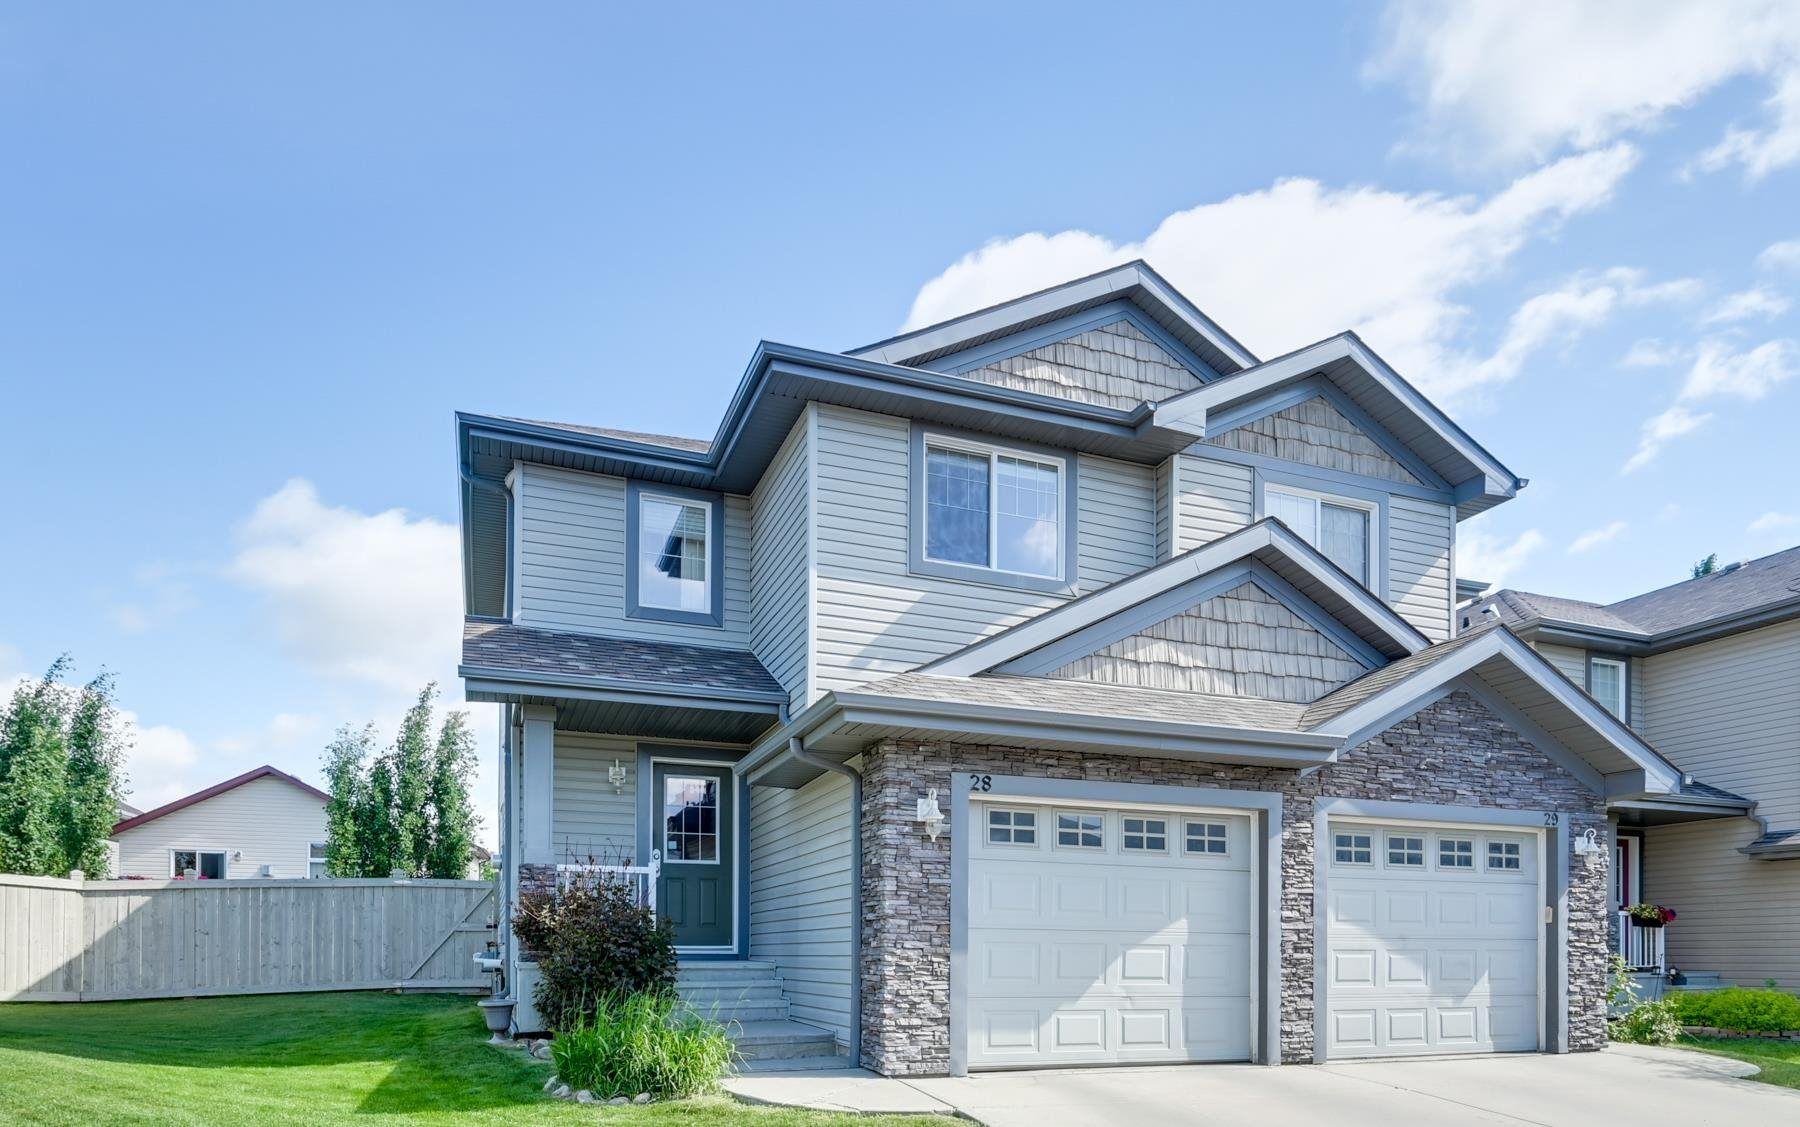 Main Photo: 28 1730 Leger Gate NW in Edmonton: Zone 14 House Half Duplex for sale : MLS®# E4250652